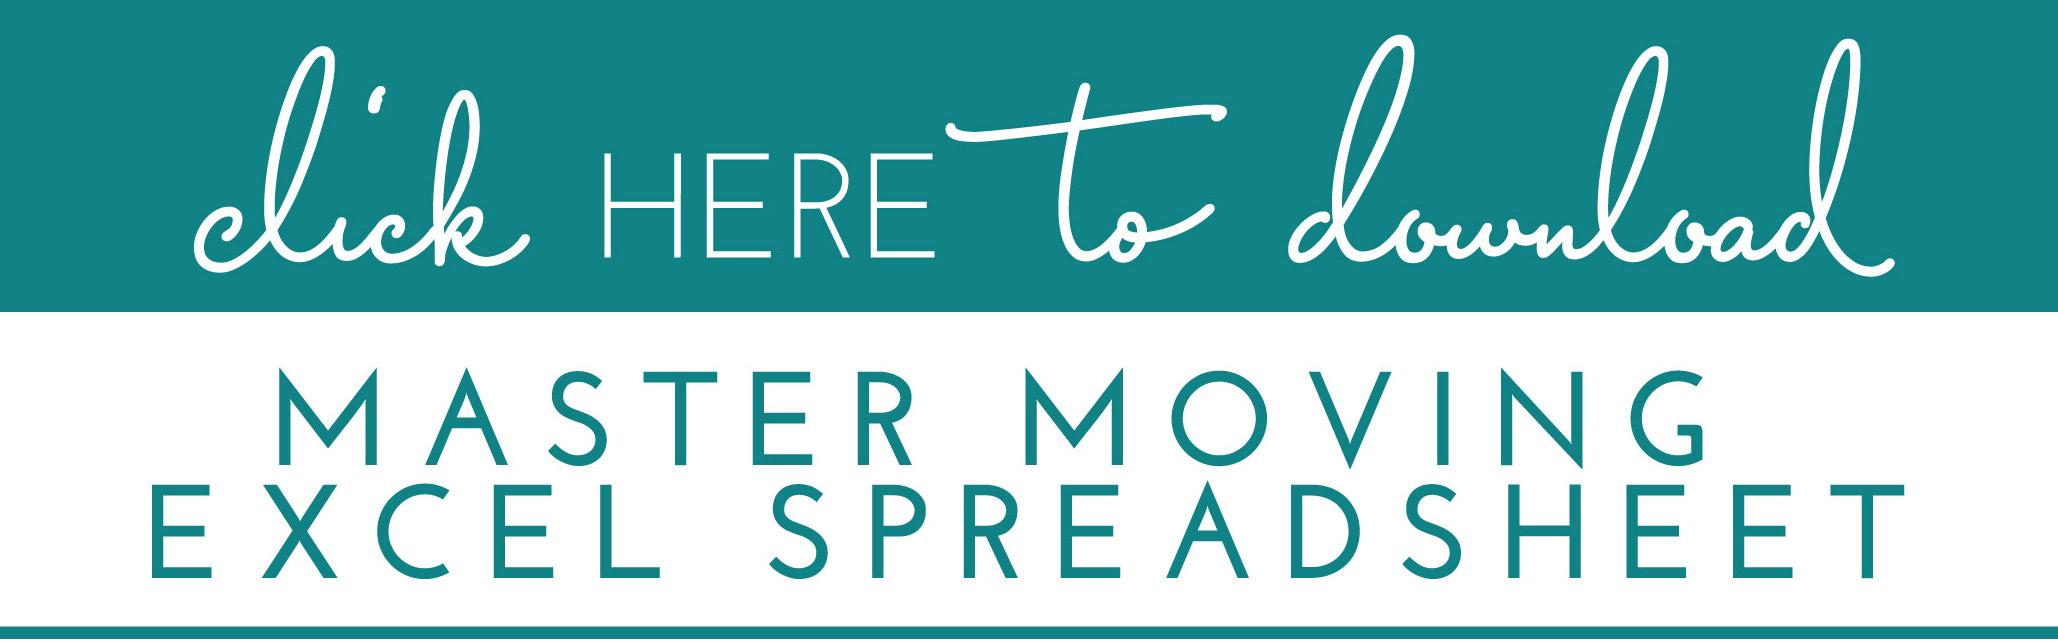 Master Moving Spreadsheet